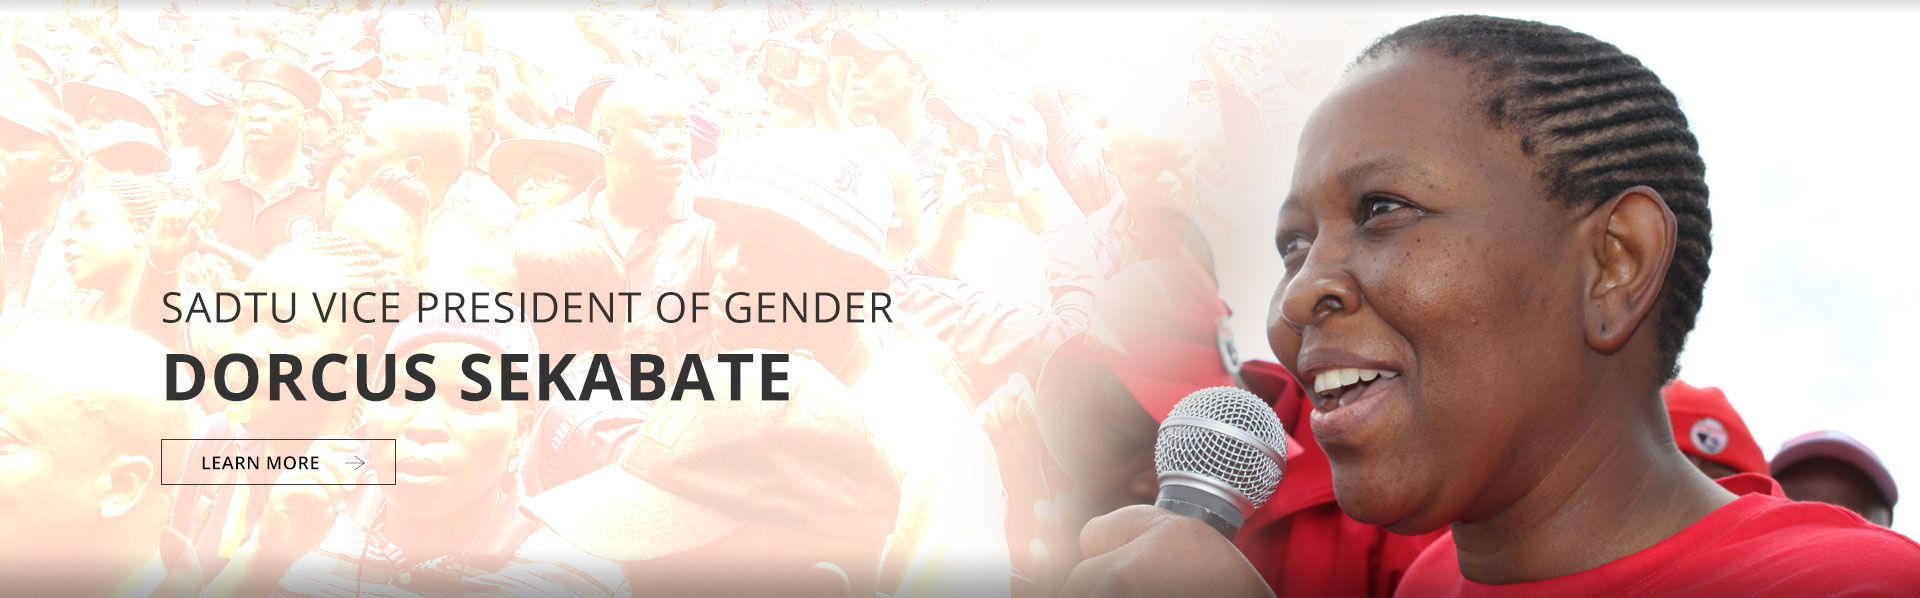 Vice President (Gender): Cde Dorcus Sekabate